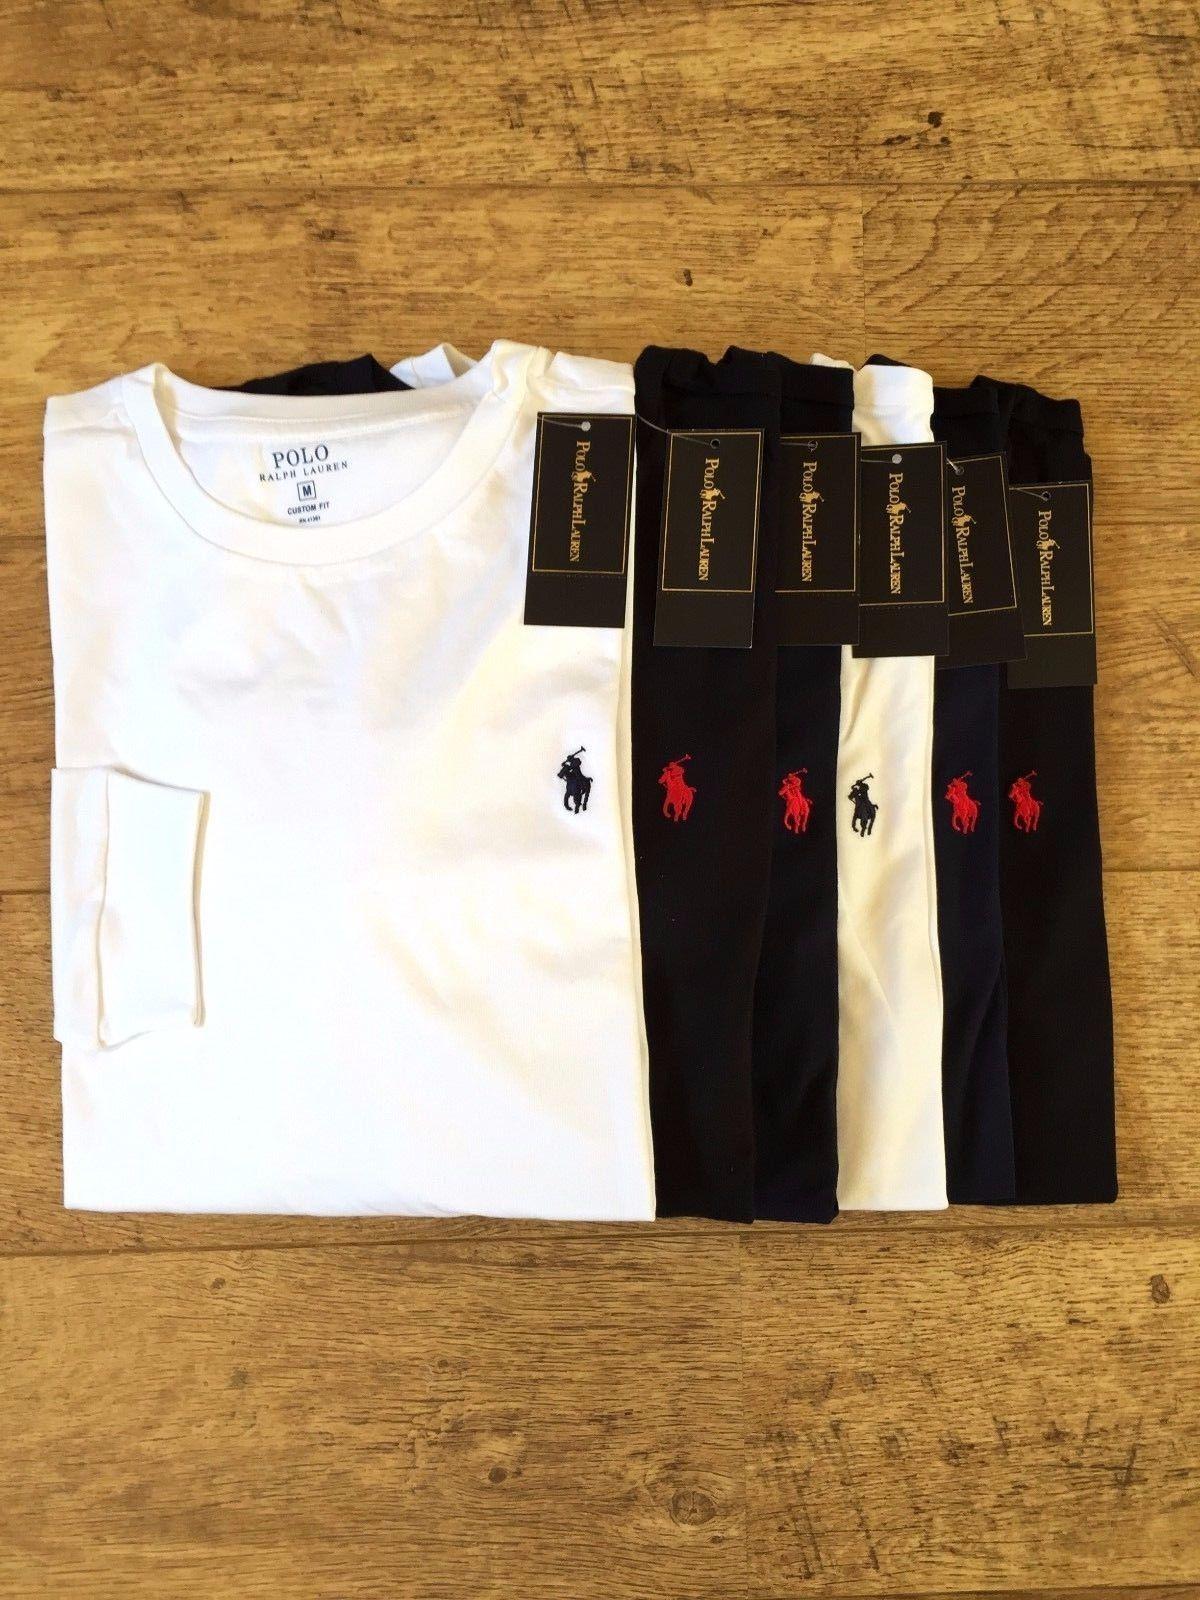 Ralph Lauren Men's Crew Neck Long Sleeve T-Shirt https://t.co/wzwzBkd6Aj https://t.co/pA5E6xyd9R